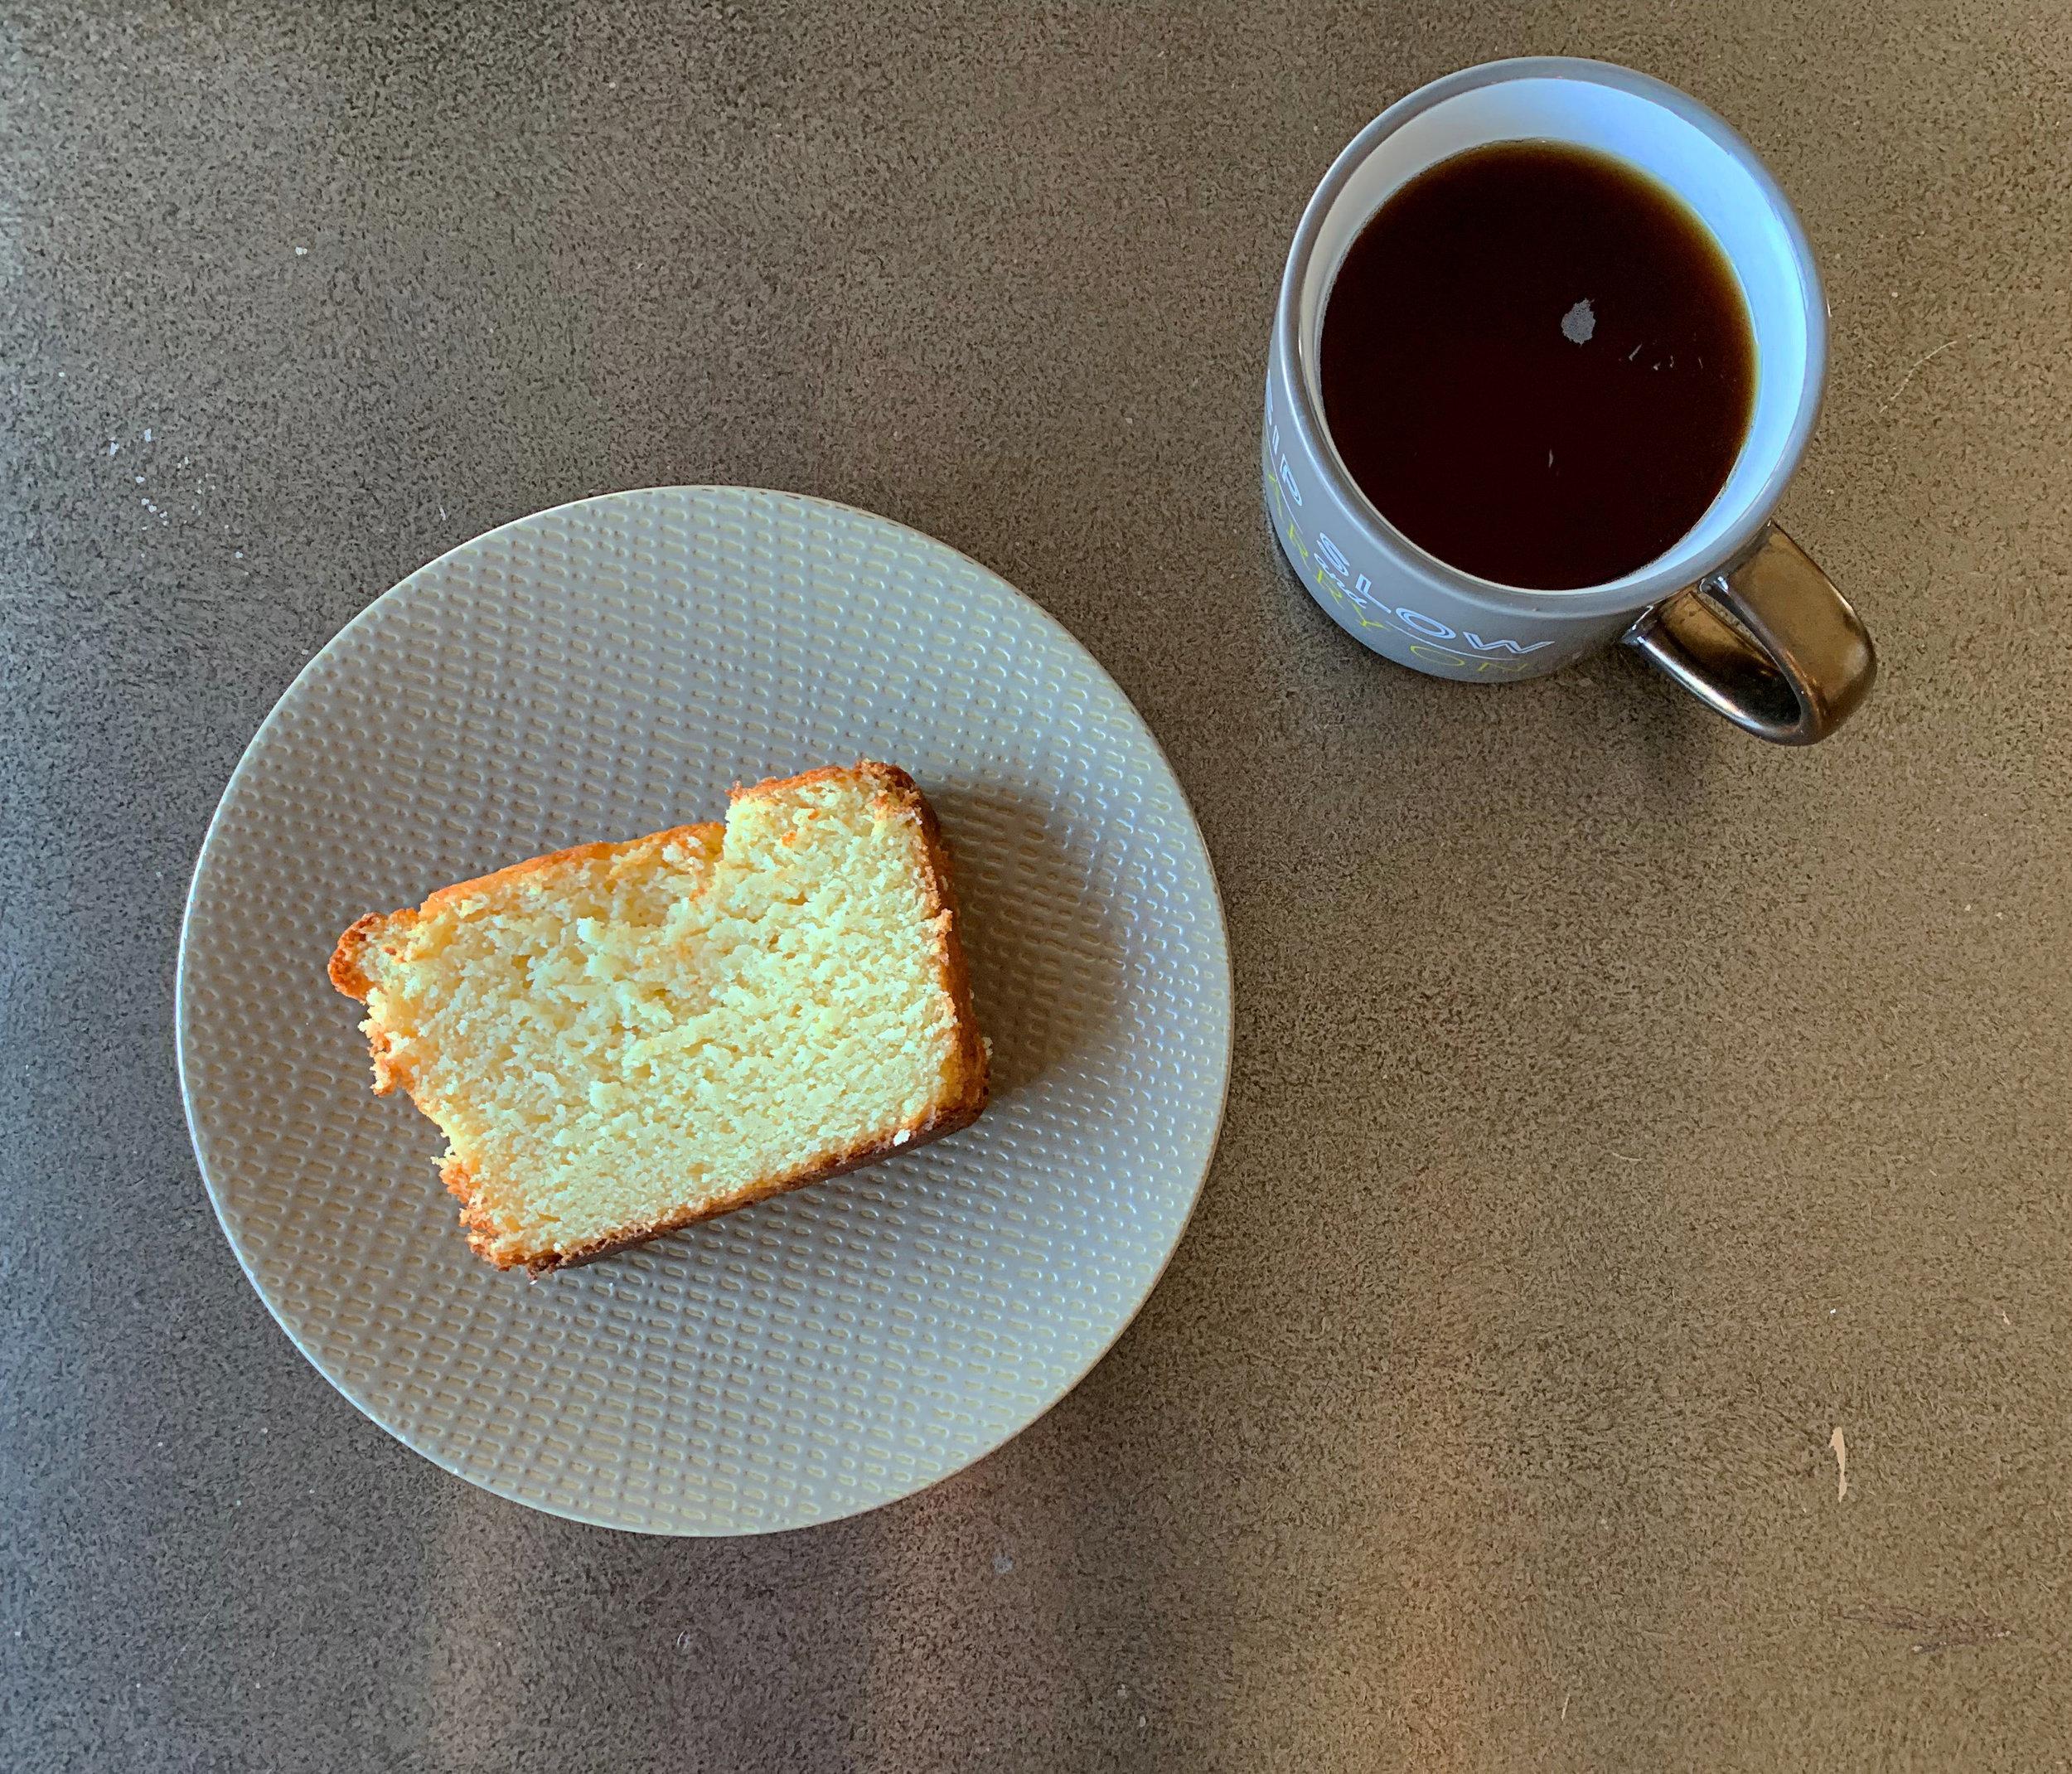 2018 01 08 Pound Cake 02.jpg